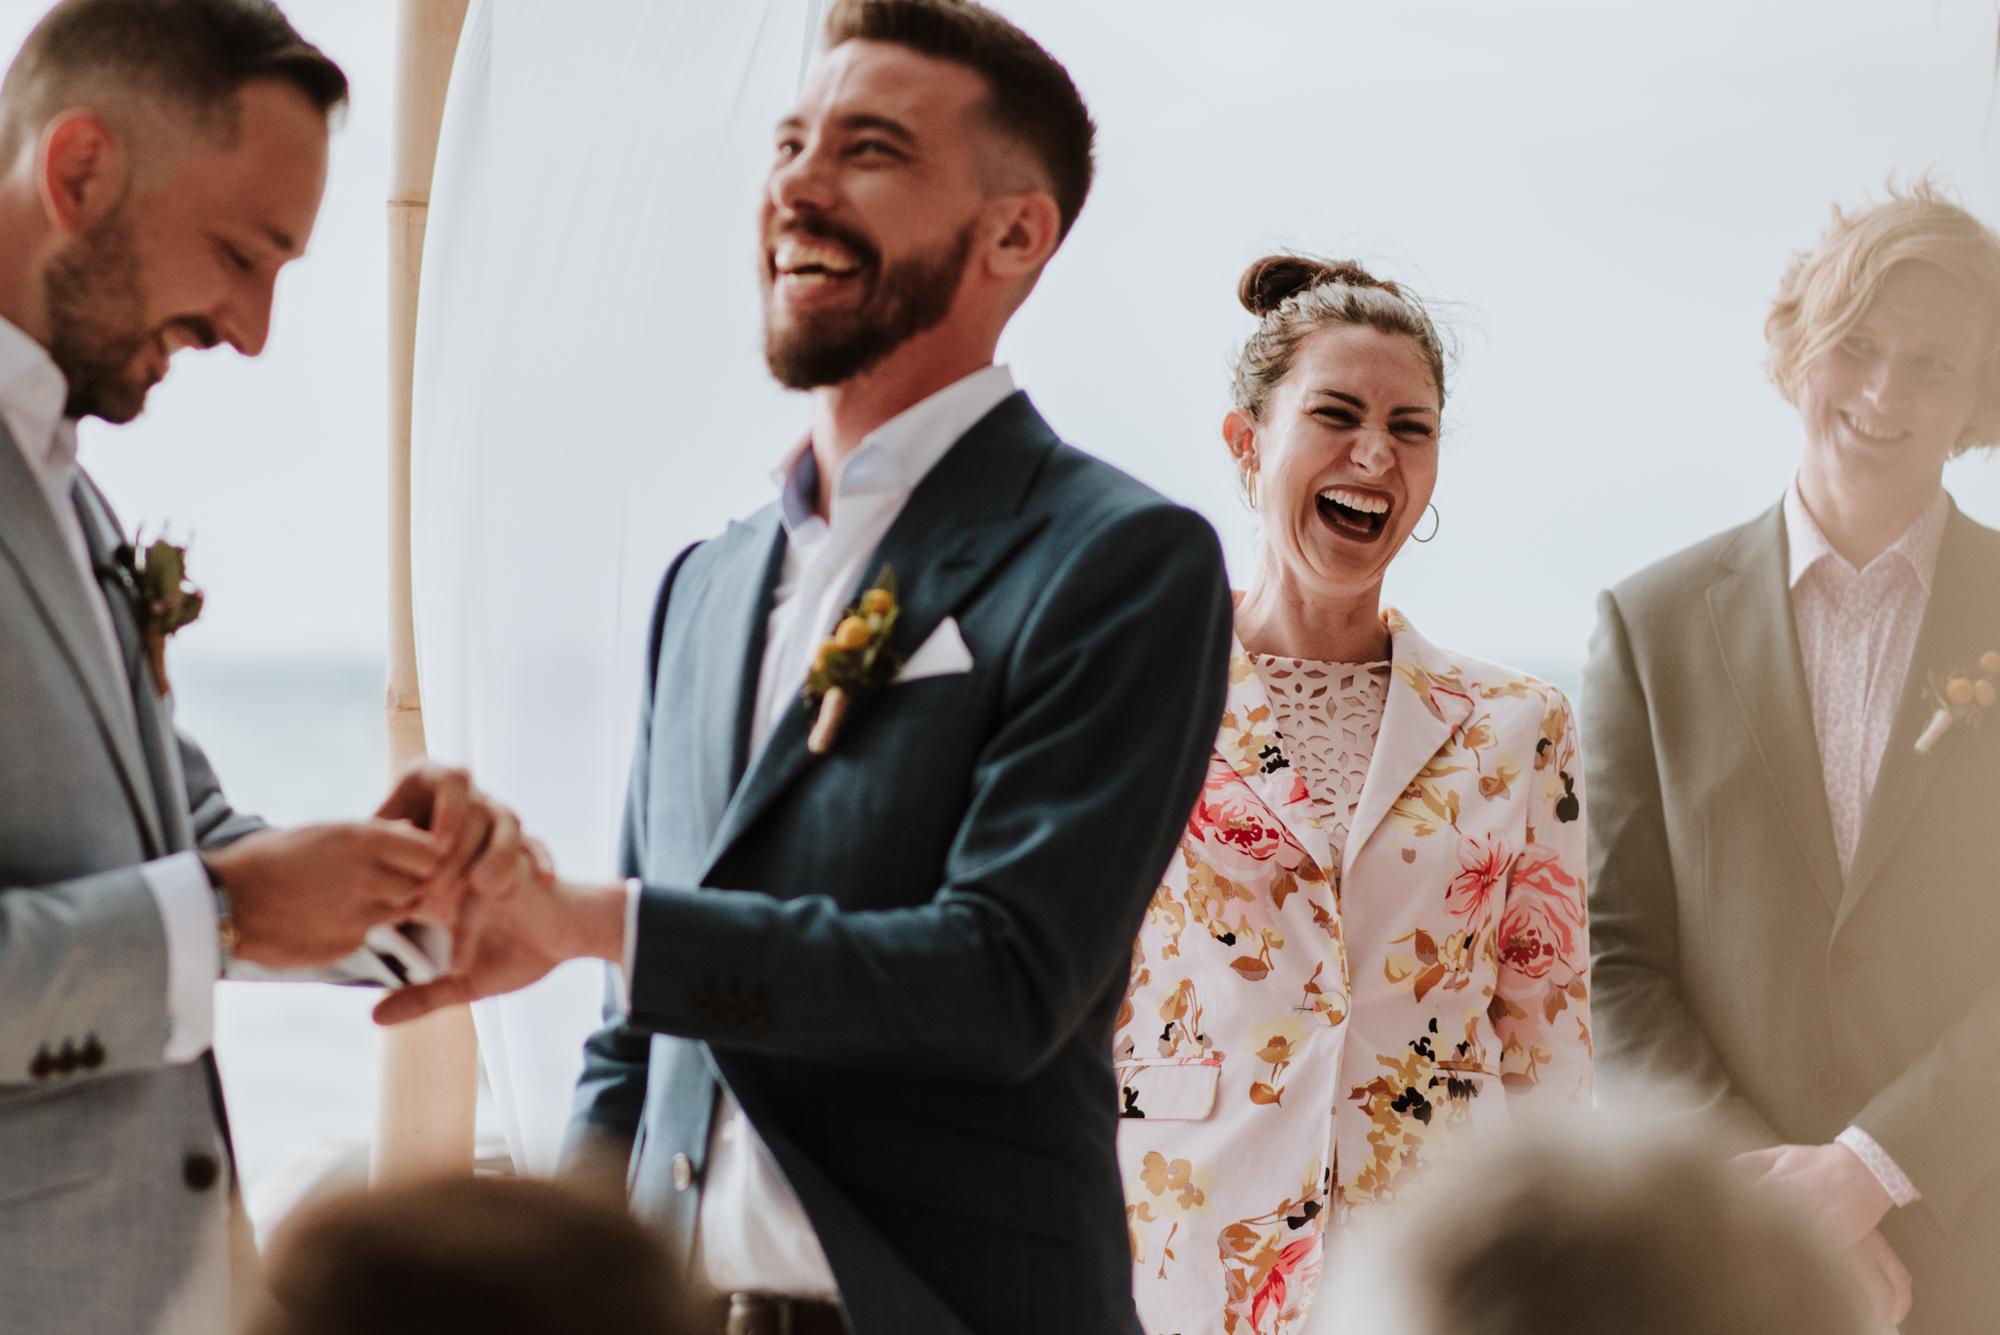 jessica-howard-photography-sean-alessandro-wedding-day-web-266.jpg